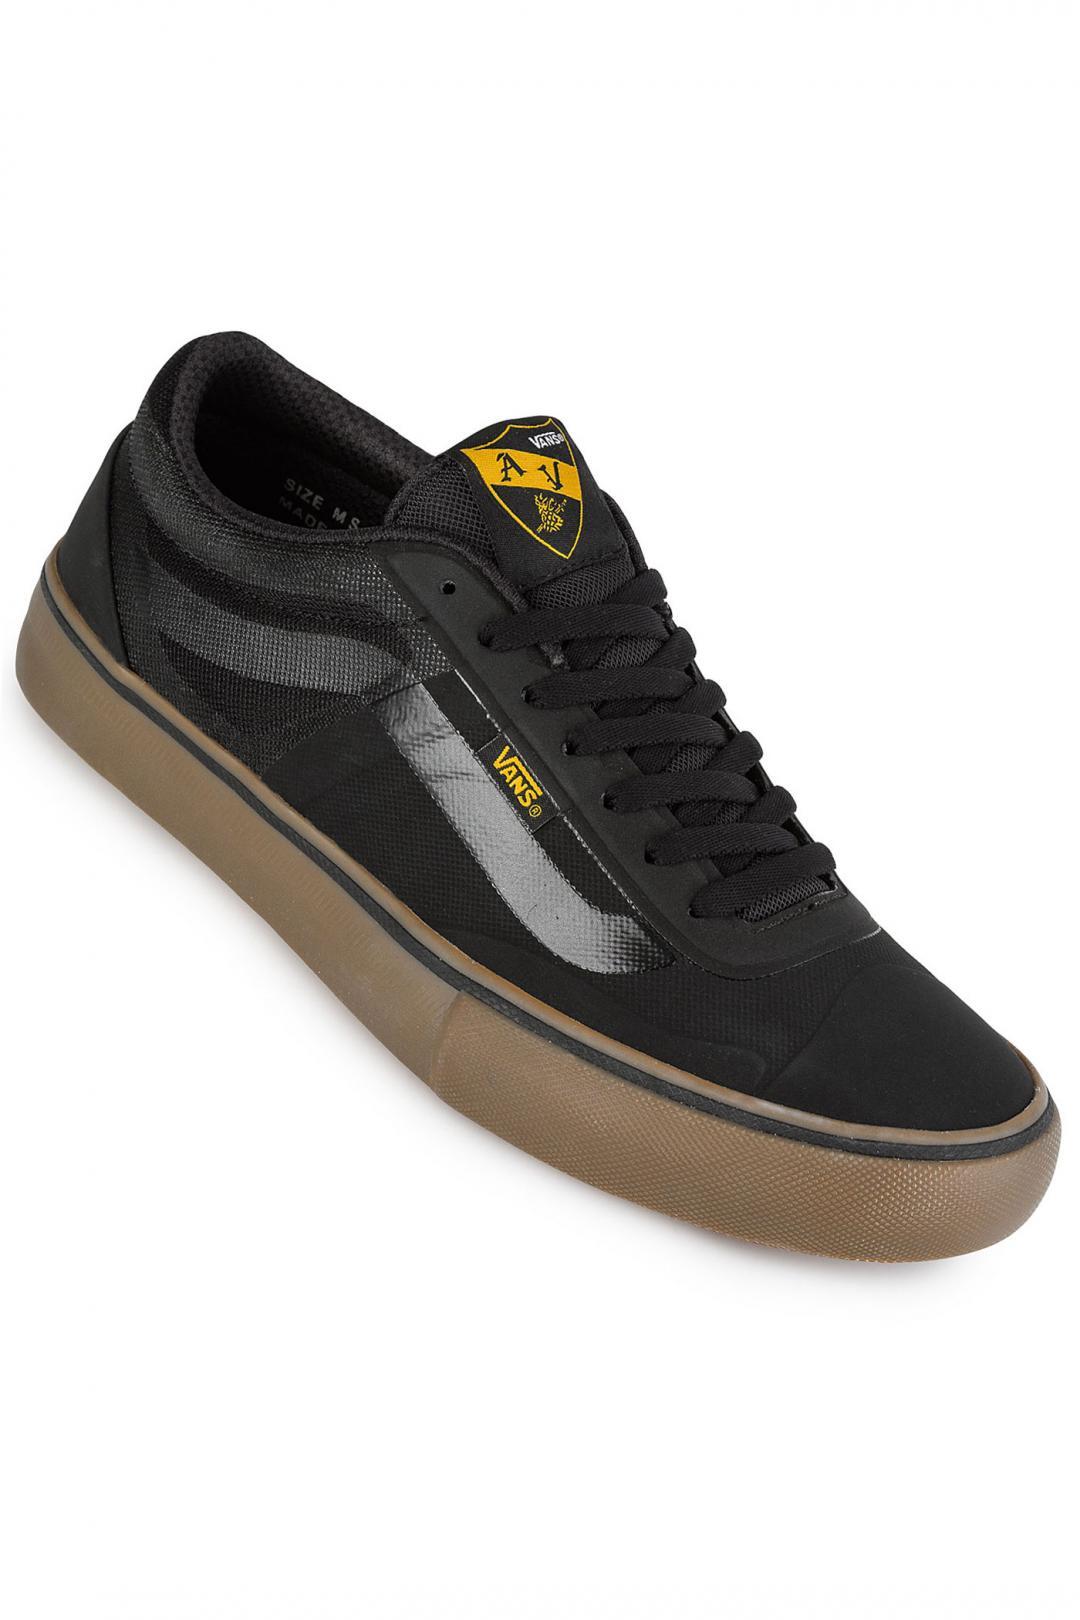 Uomo Vans AV Rapidweld Pro black gum tawny olive   Sneaker